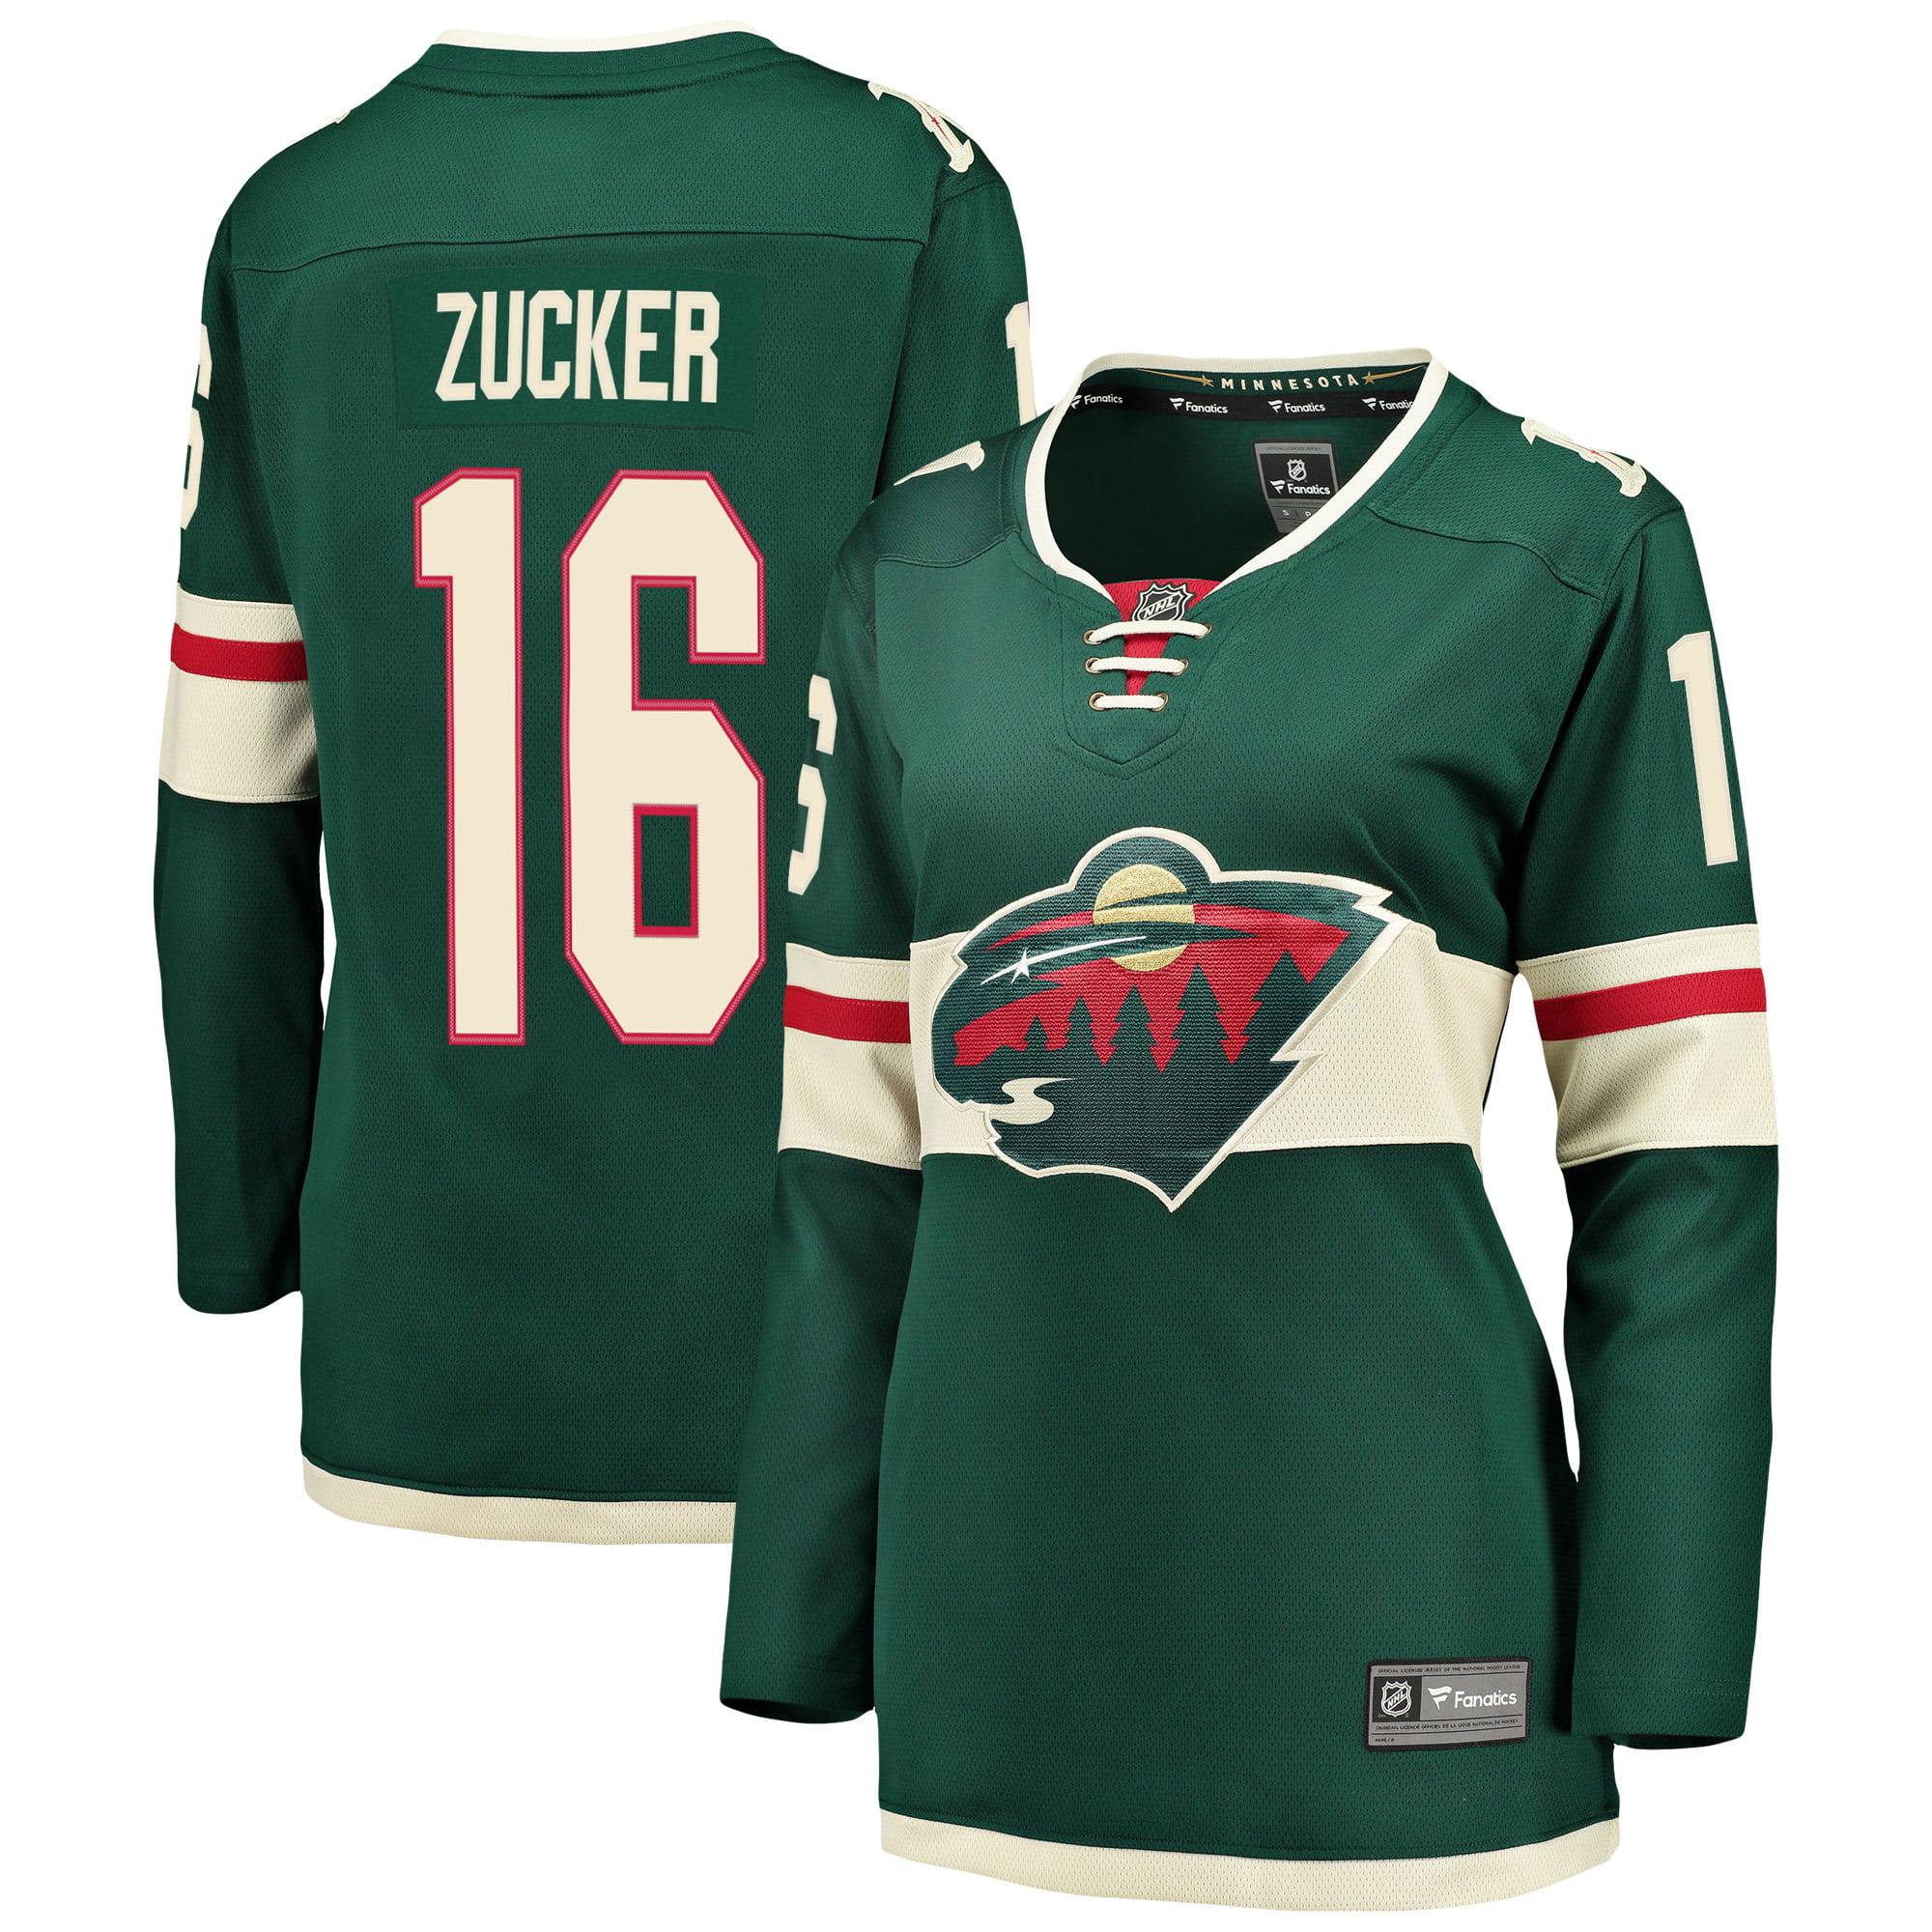 Jason Zucker Minnesota Wild Fanatics Branded Women's Breakaway Player Jersey - Green